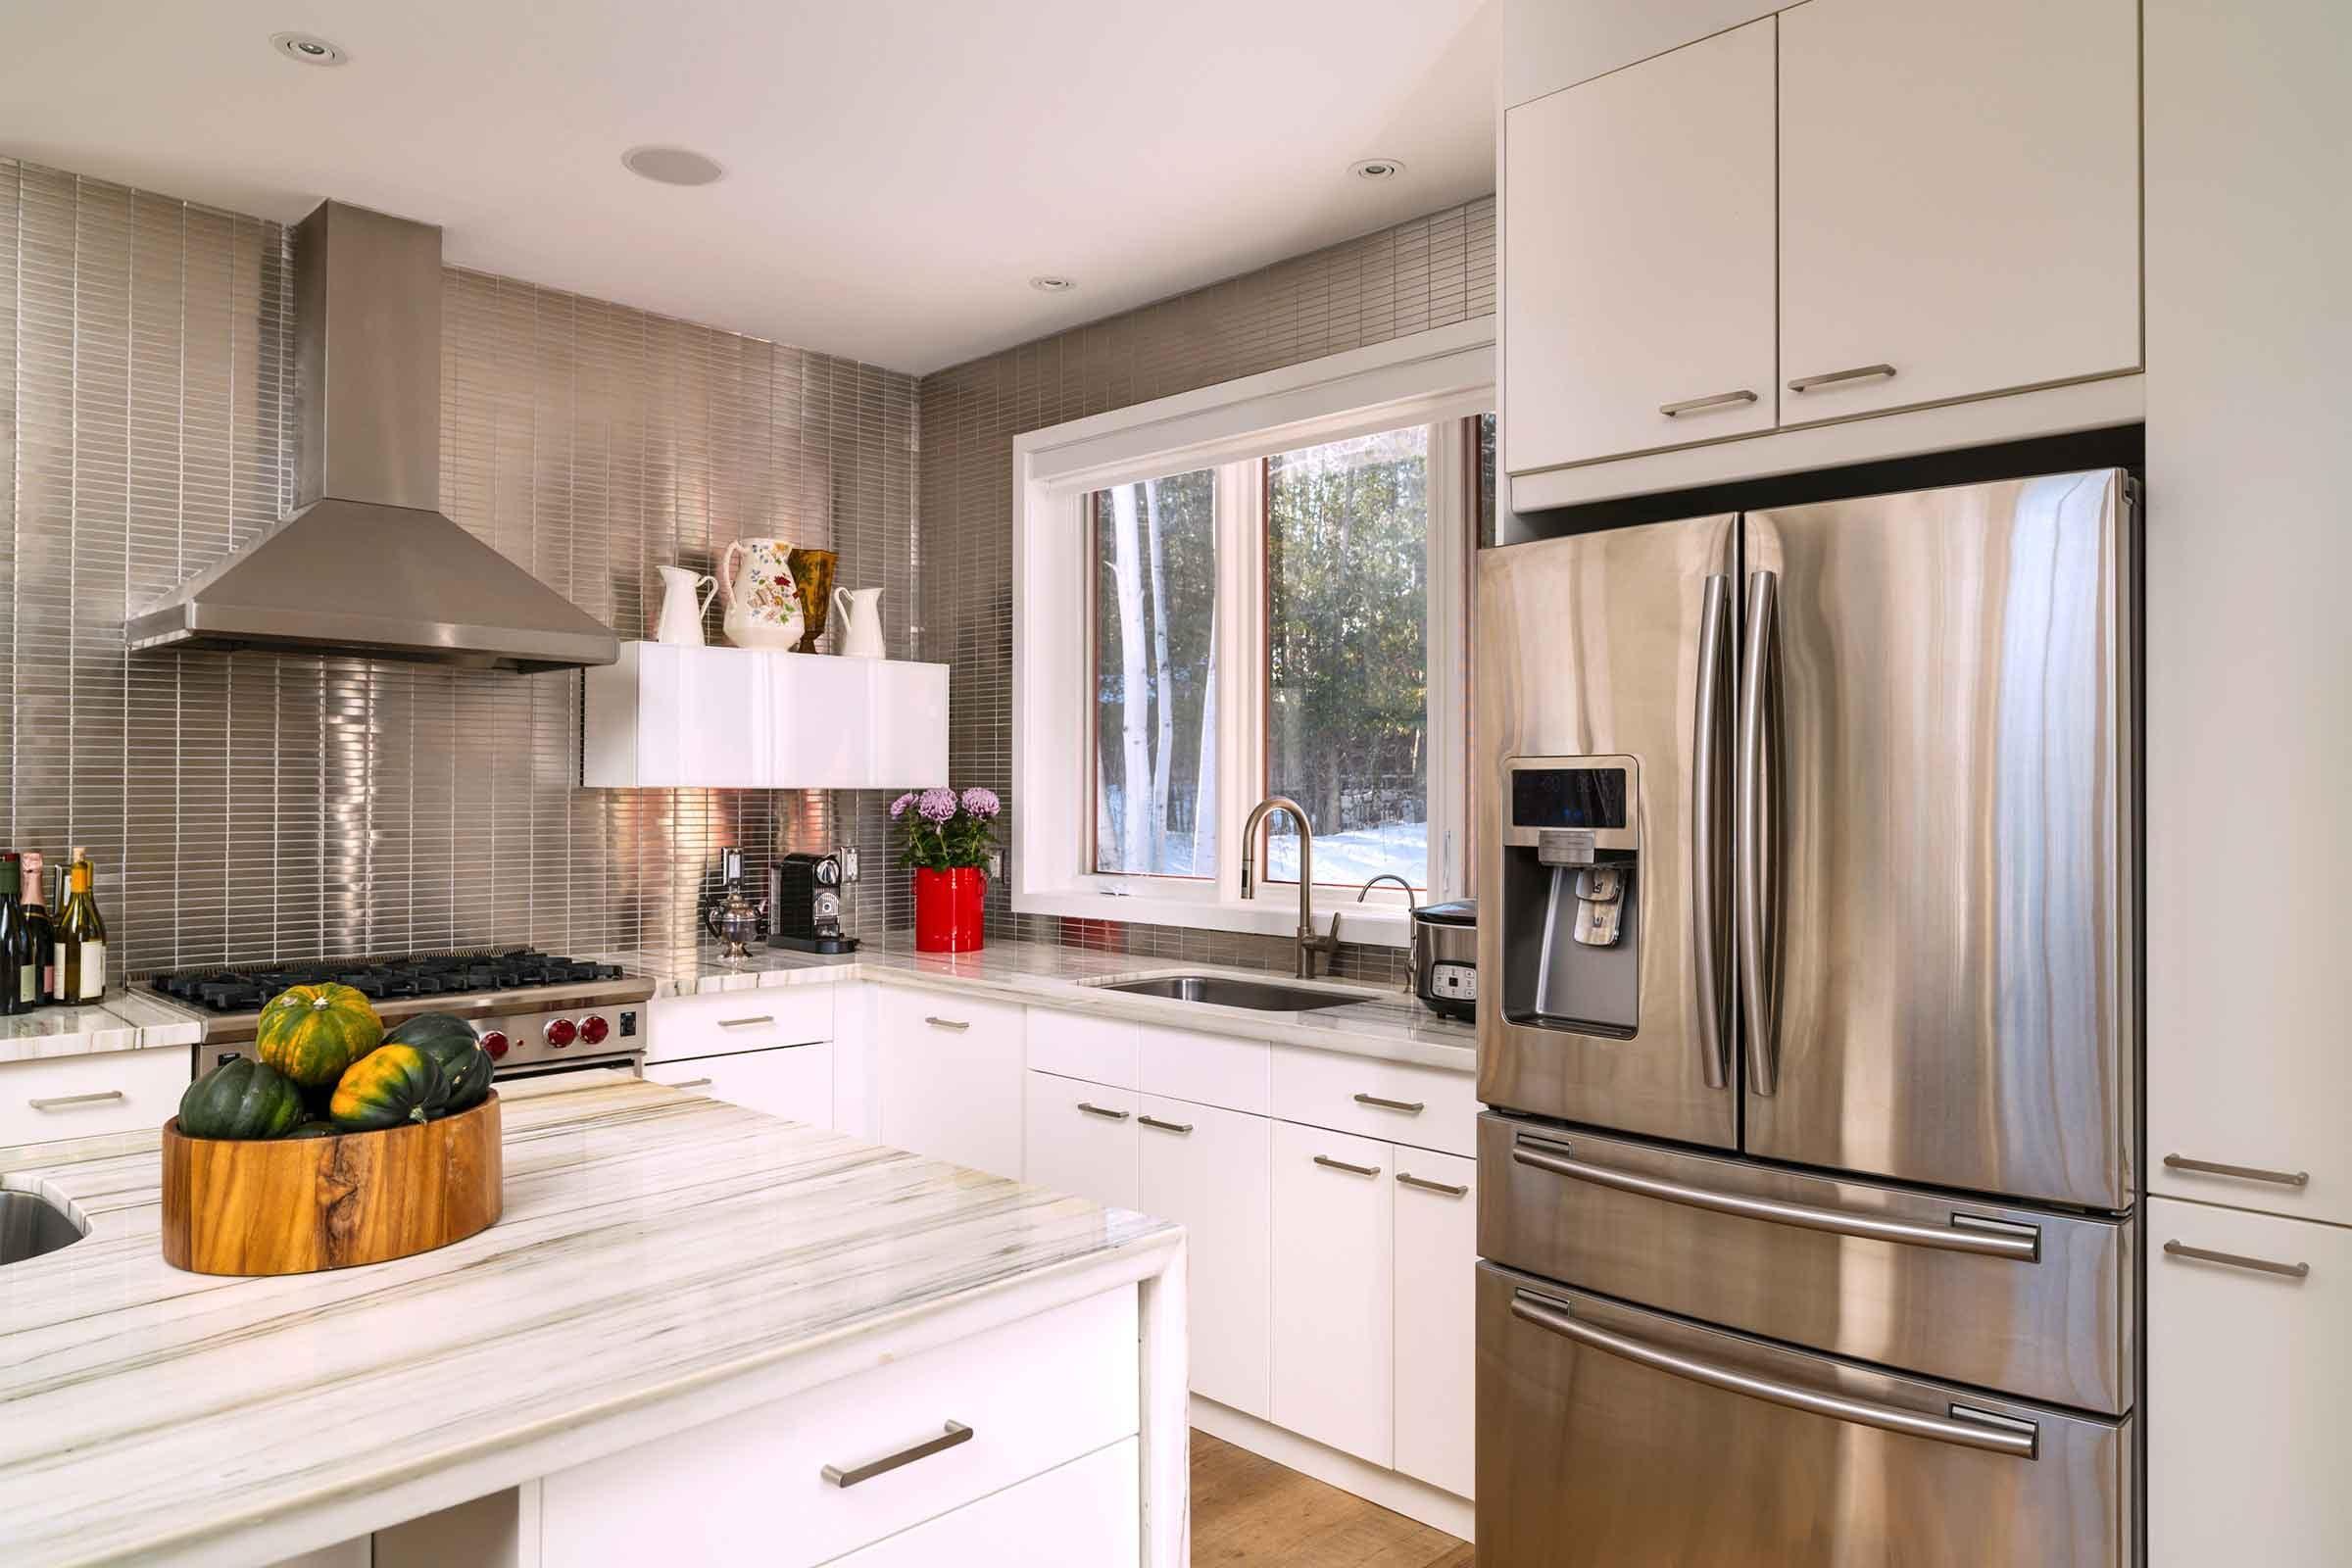 Kitchen Design Ideas That Look Expensive Reader39s Digest